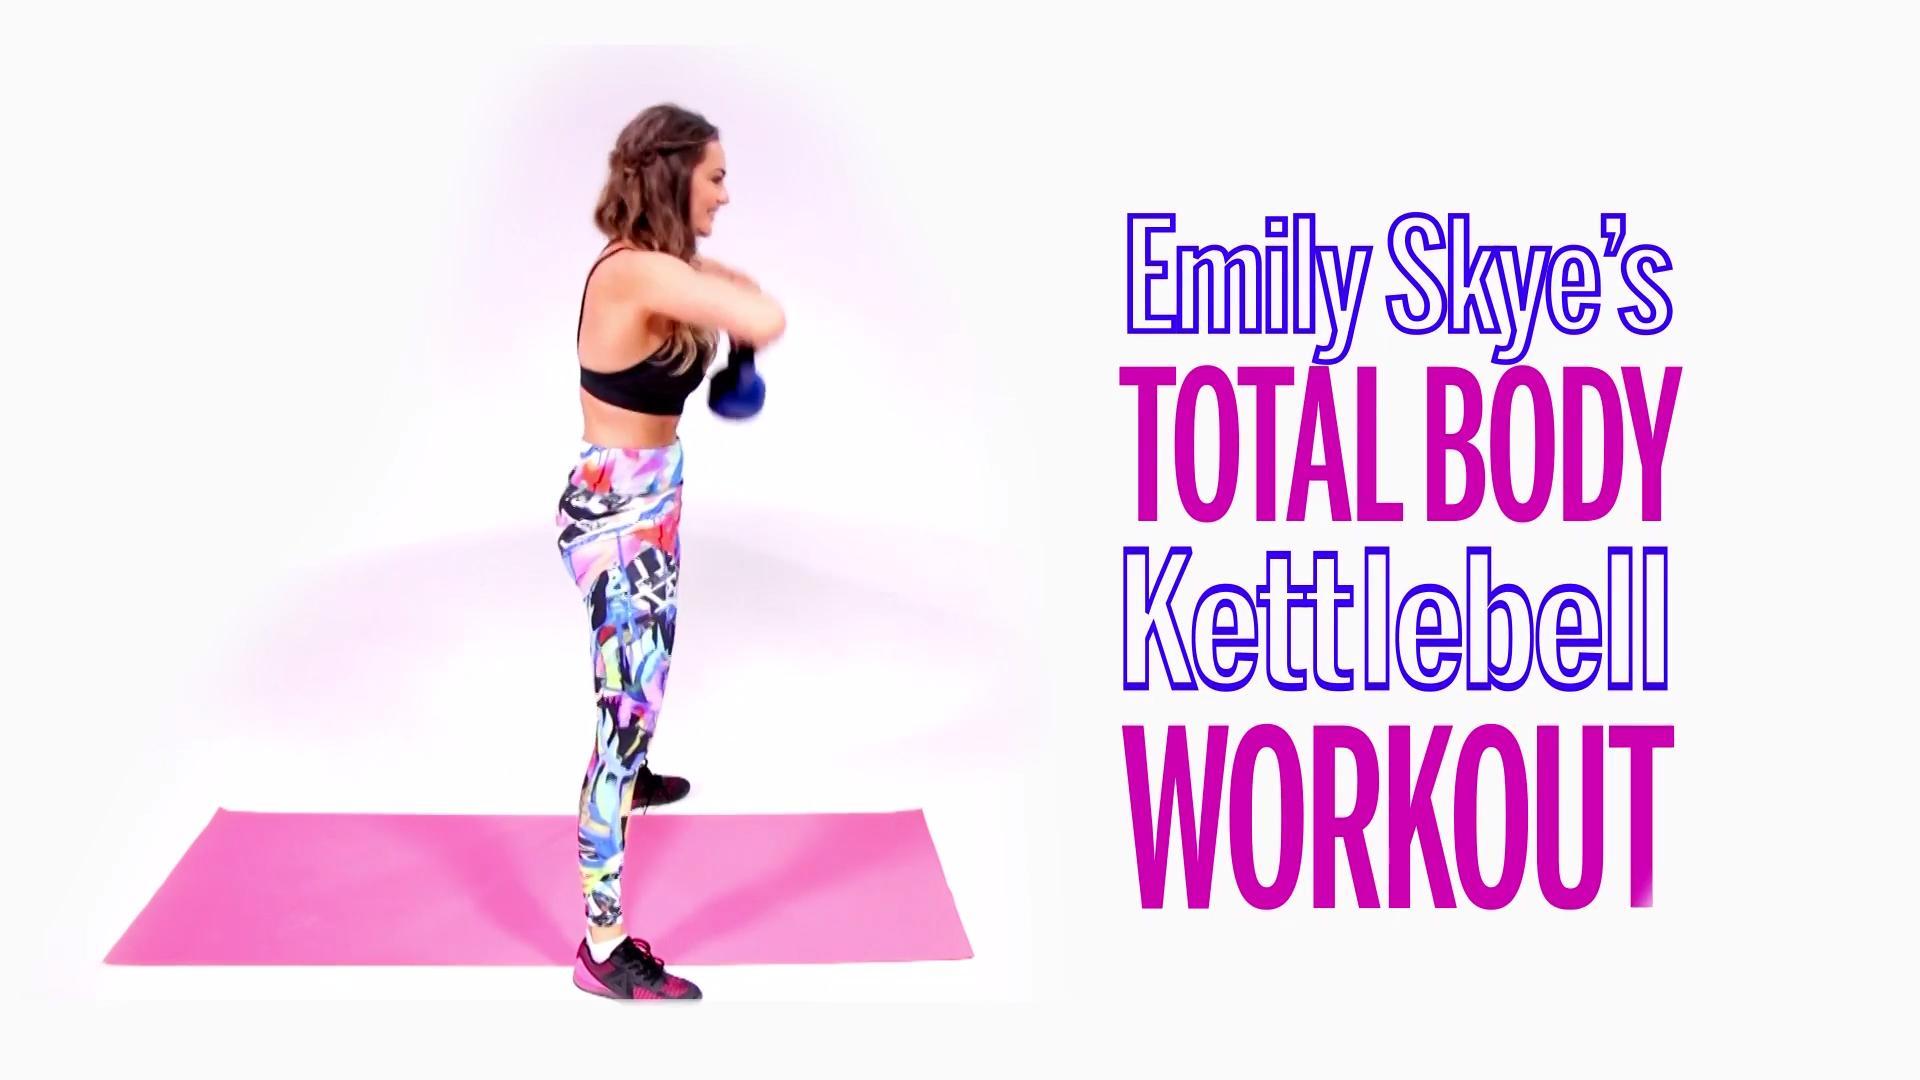 Emily Skye's Total-Body Kettlebell Workout